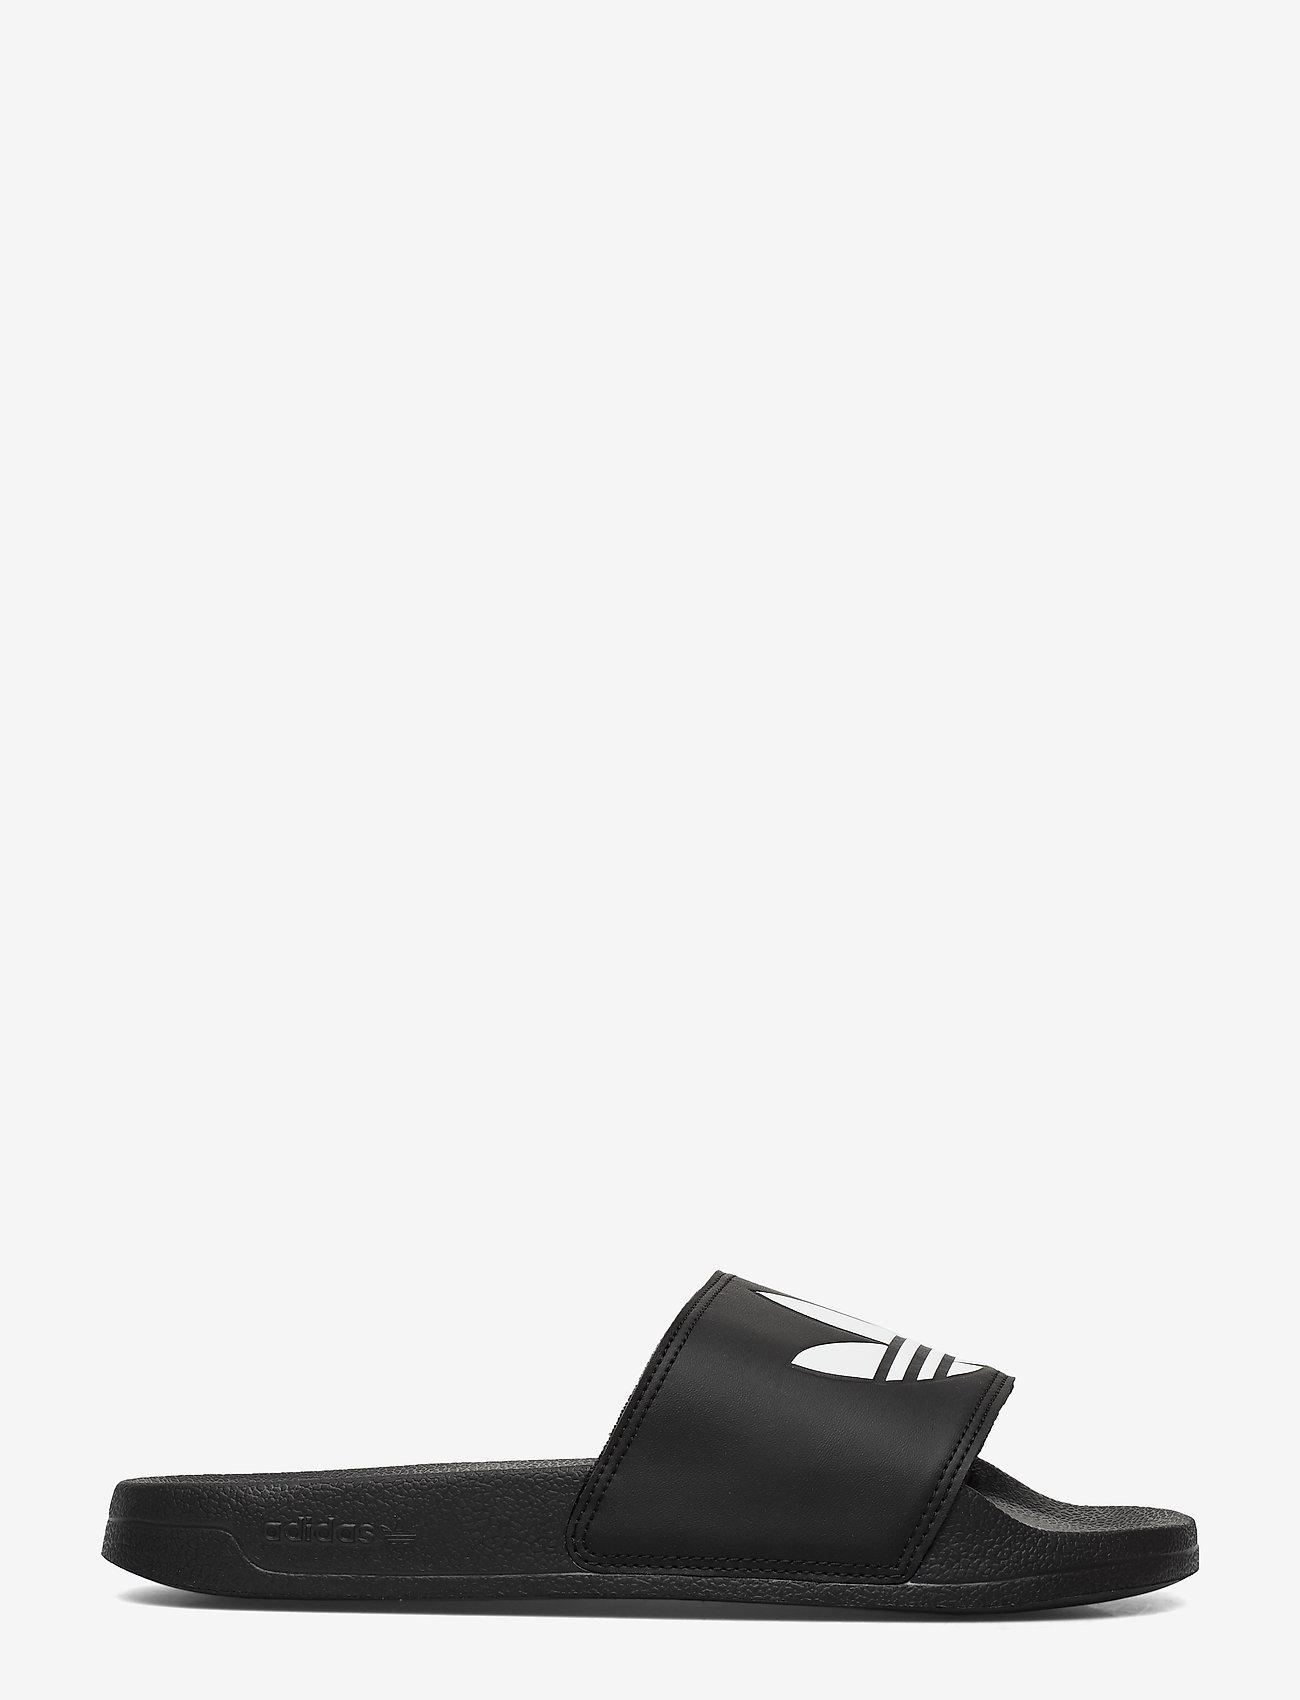 adidas Originals - Adilette Lite Slides - sneakers - cblack/ftwwht/cblack - 1